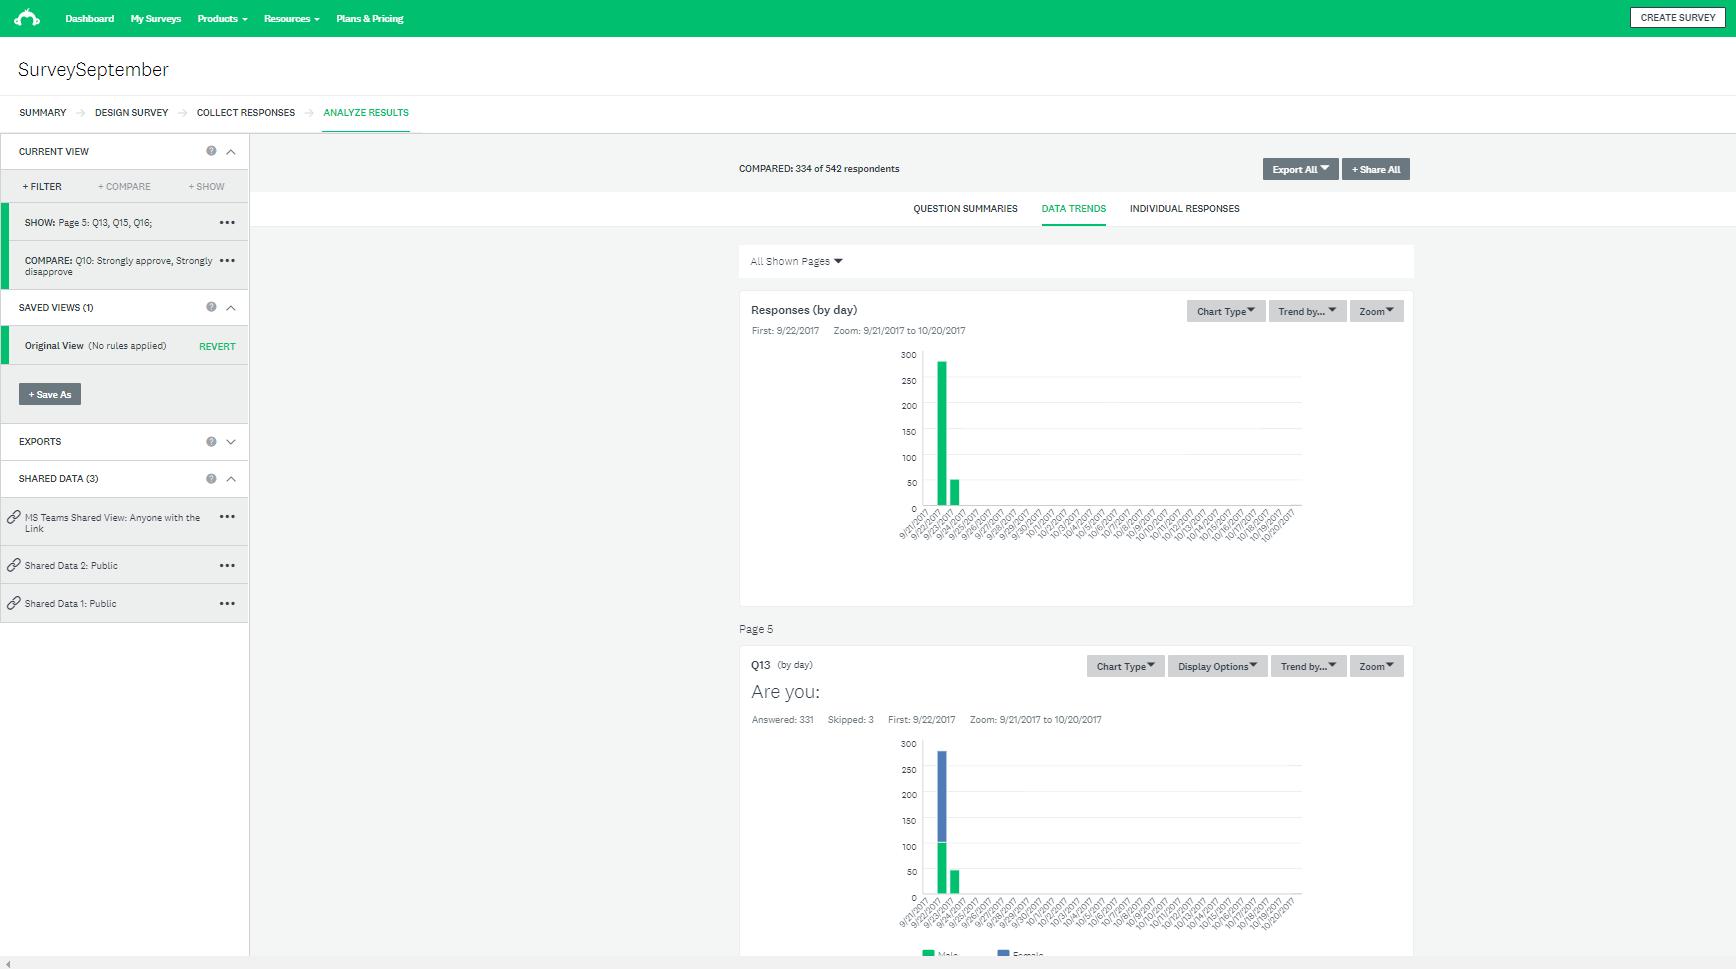 SurveyMonkey Software - Data trends